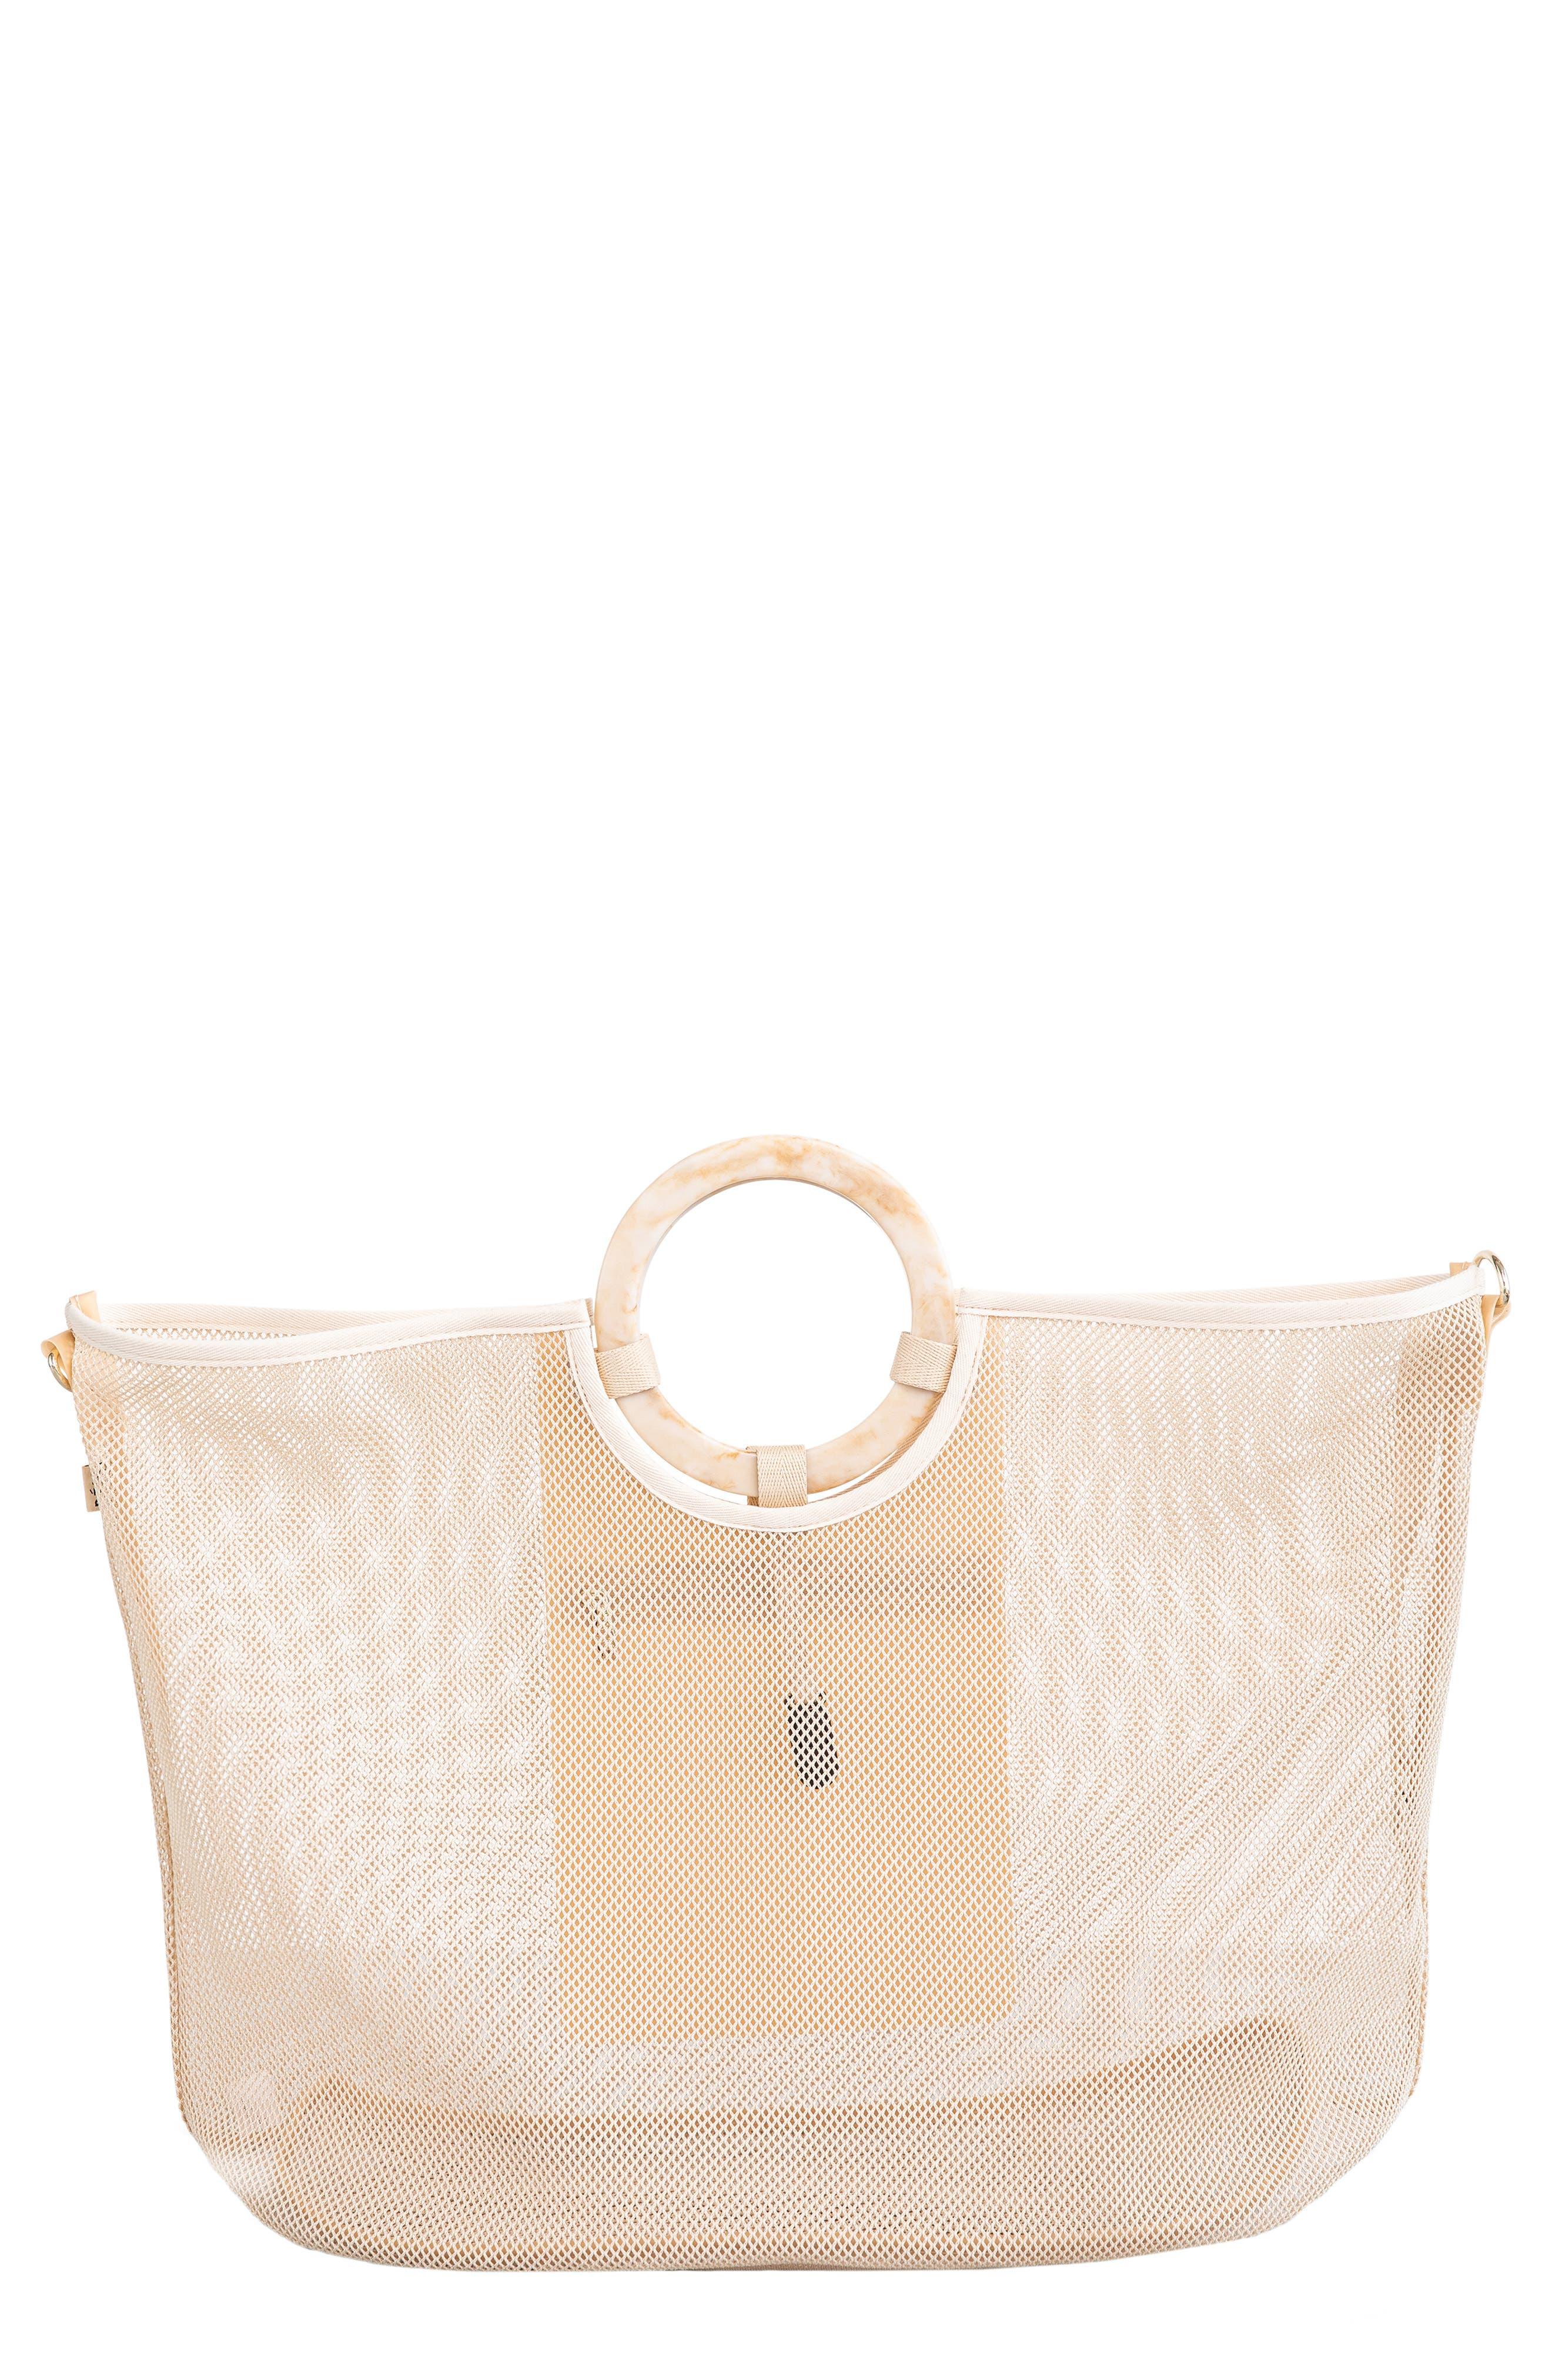 The Beach Bag Tote